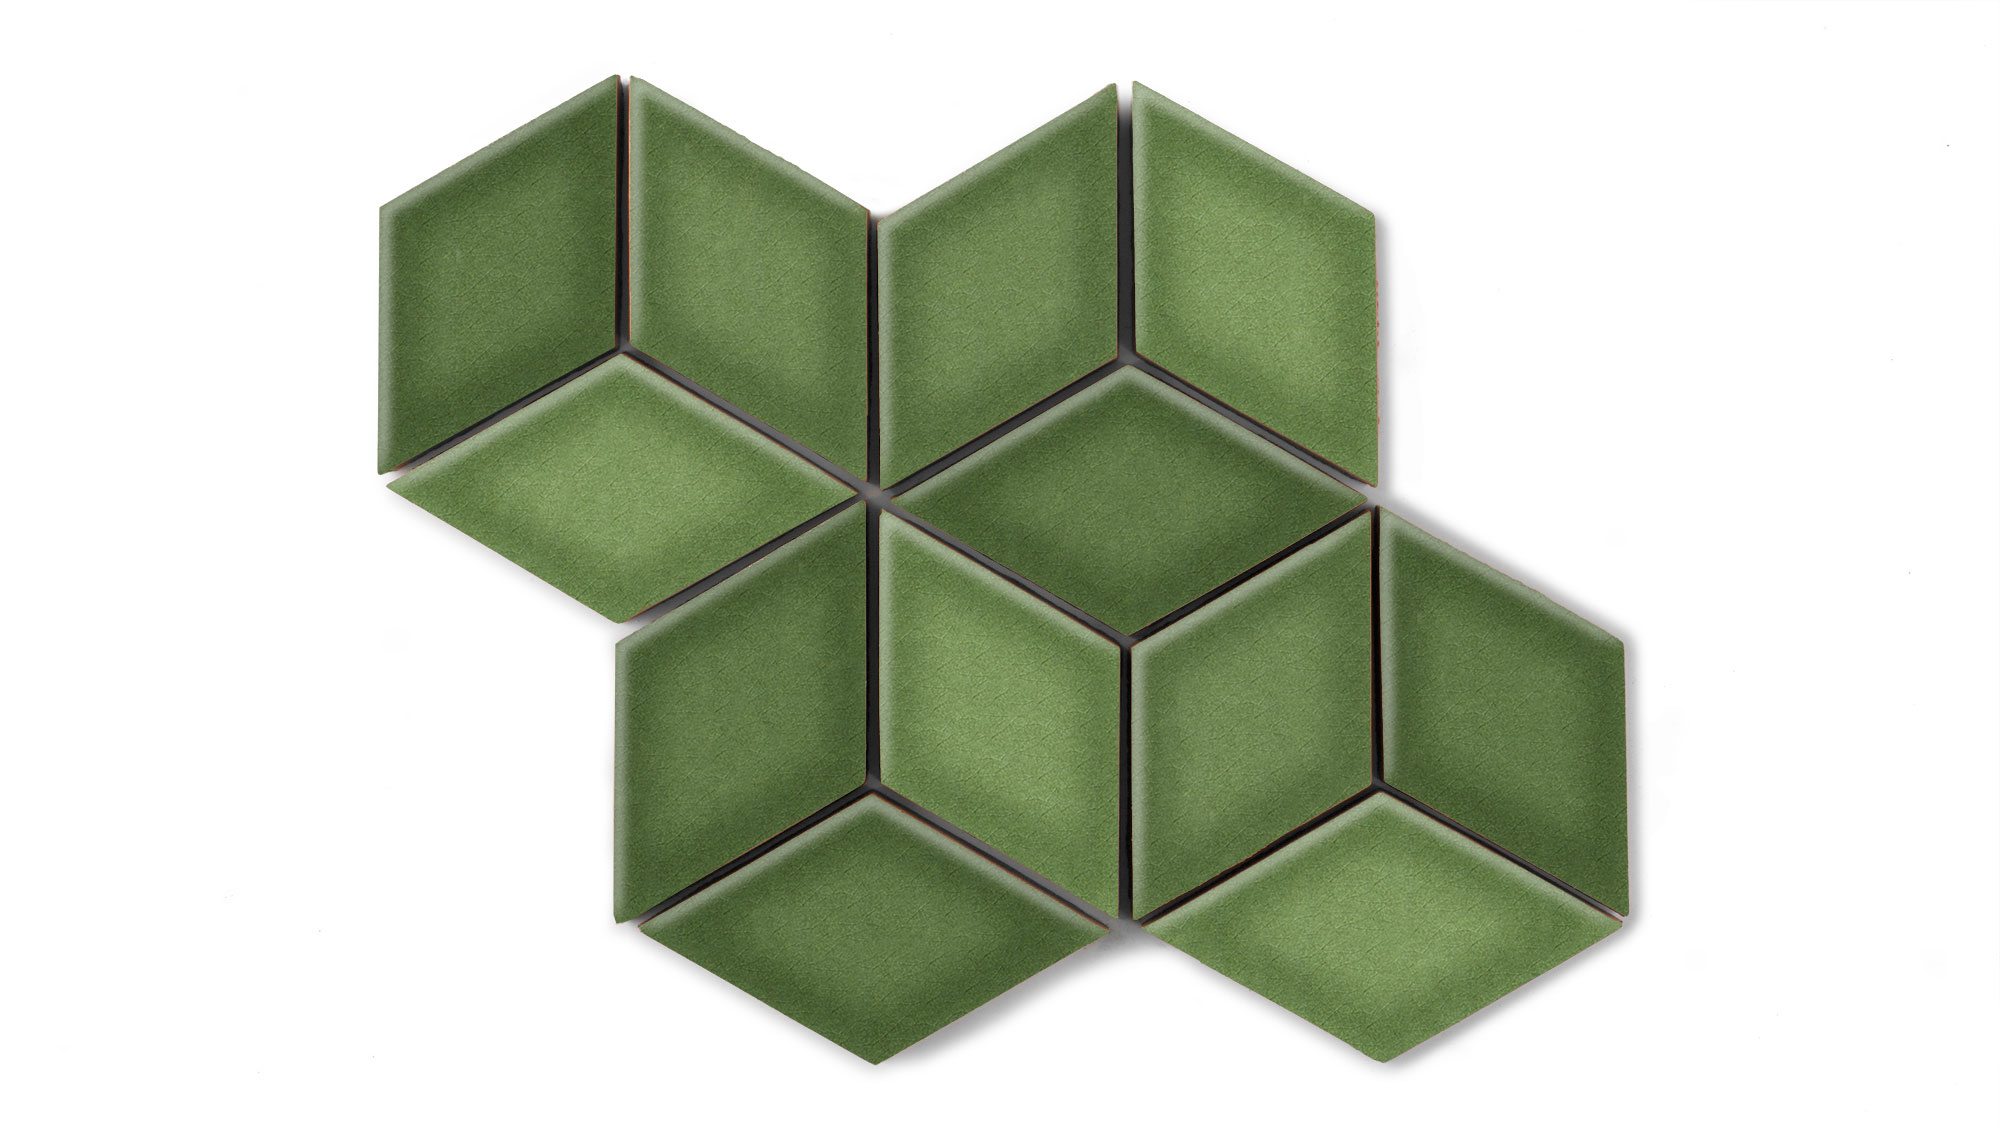 rendering_kelp_diamond_small_recycled_escher.jpg